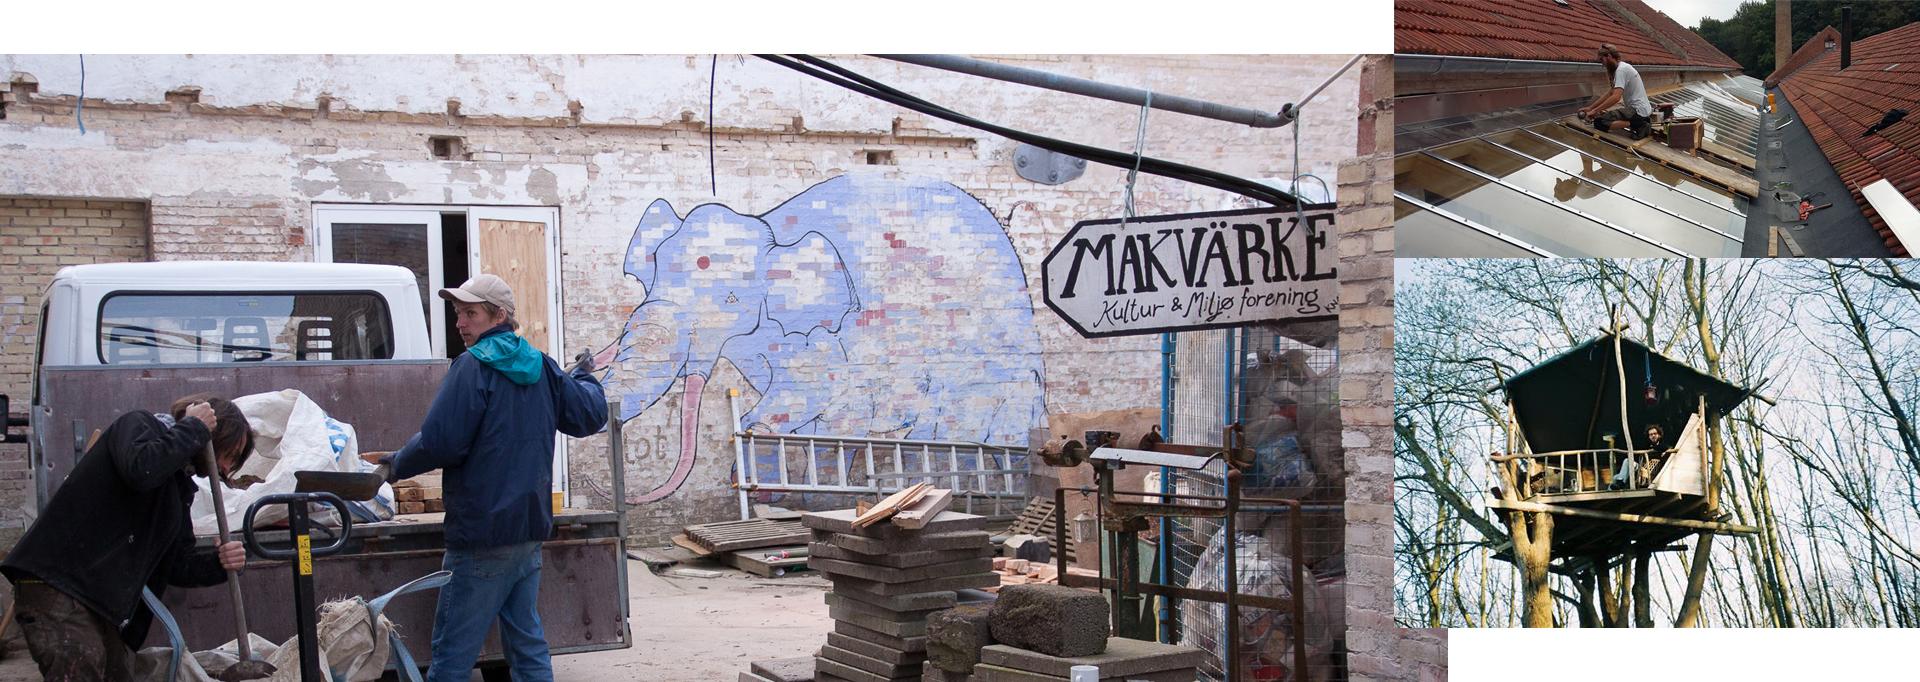 Markvark-Top